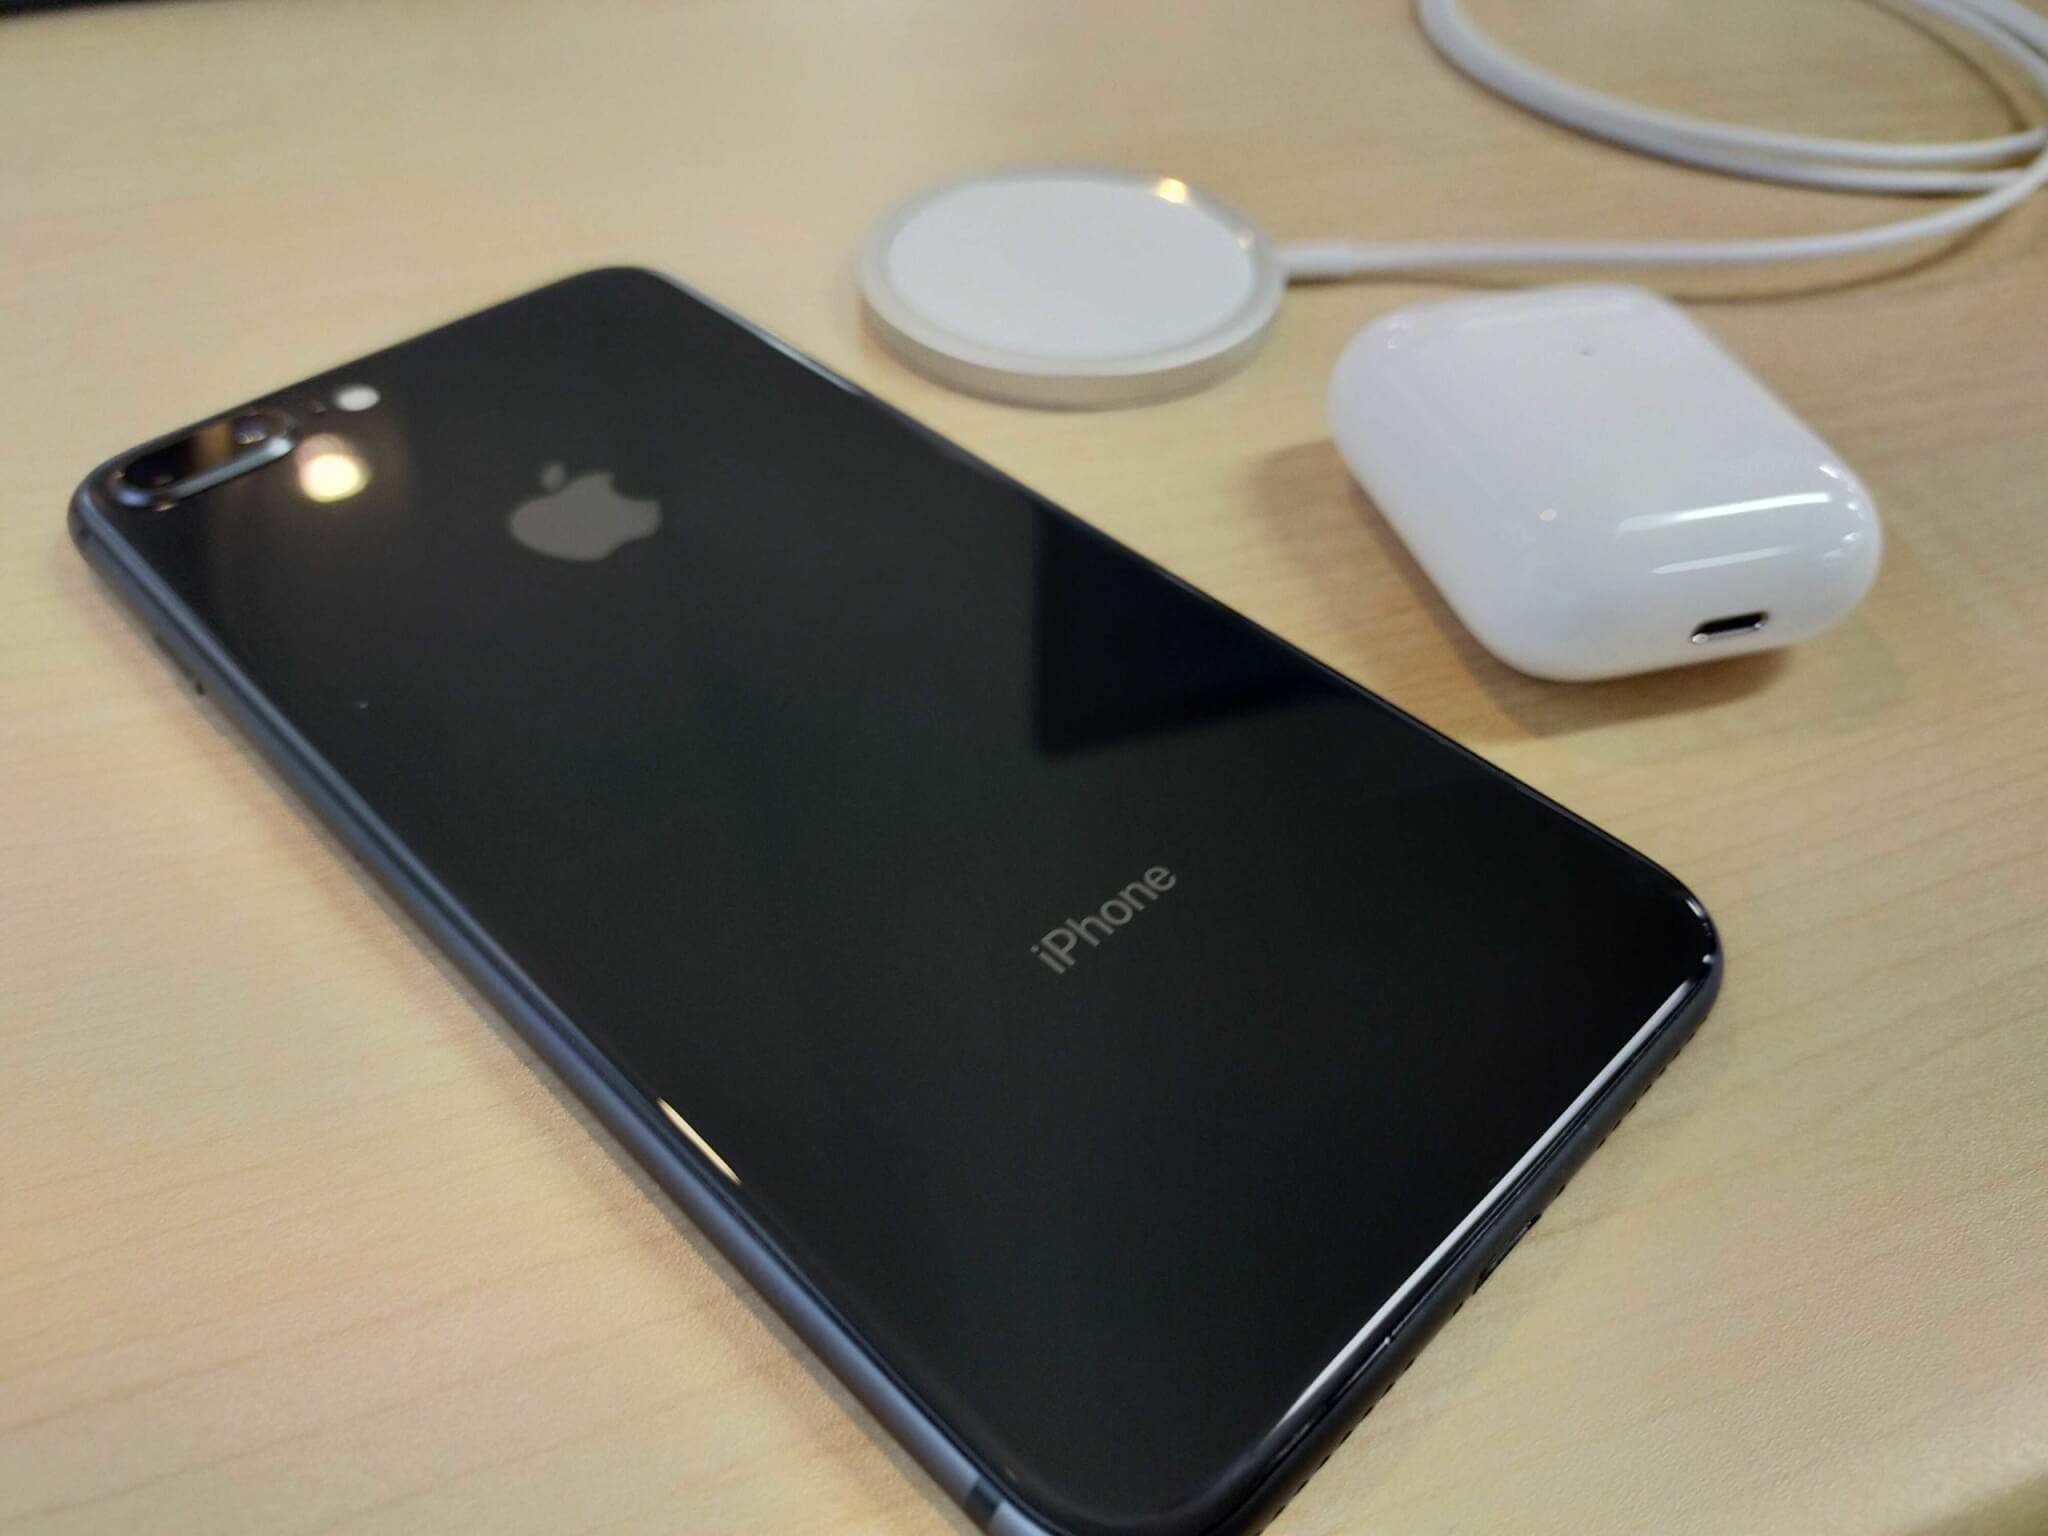 AppleのMagSafe充電器は互換性が高い